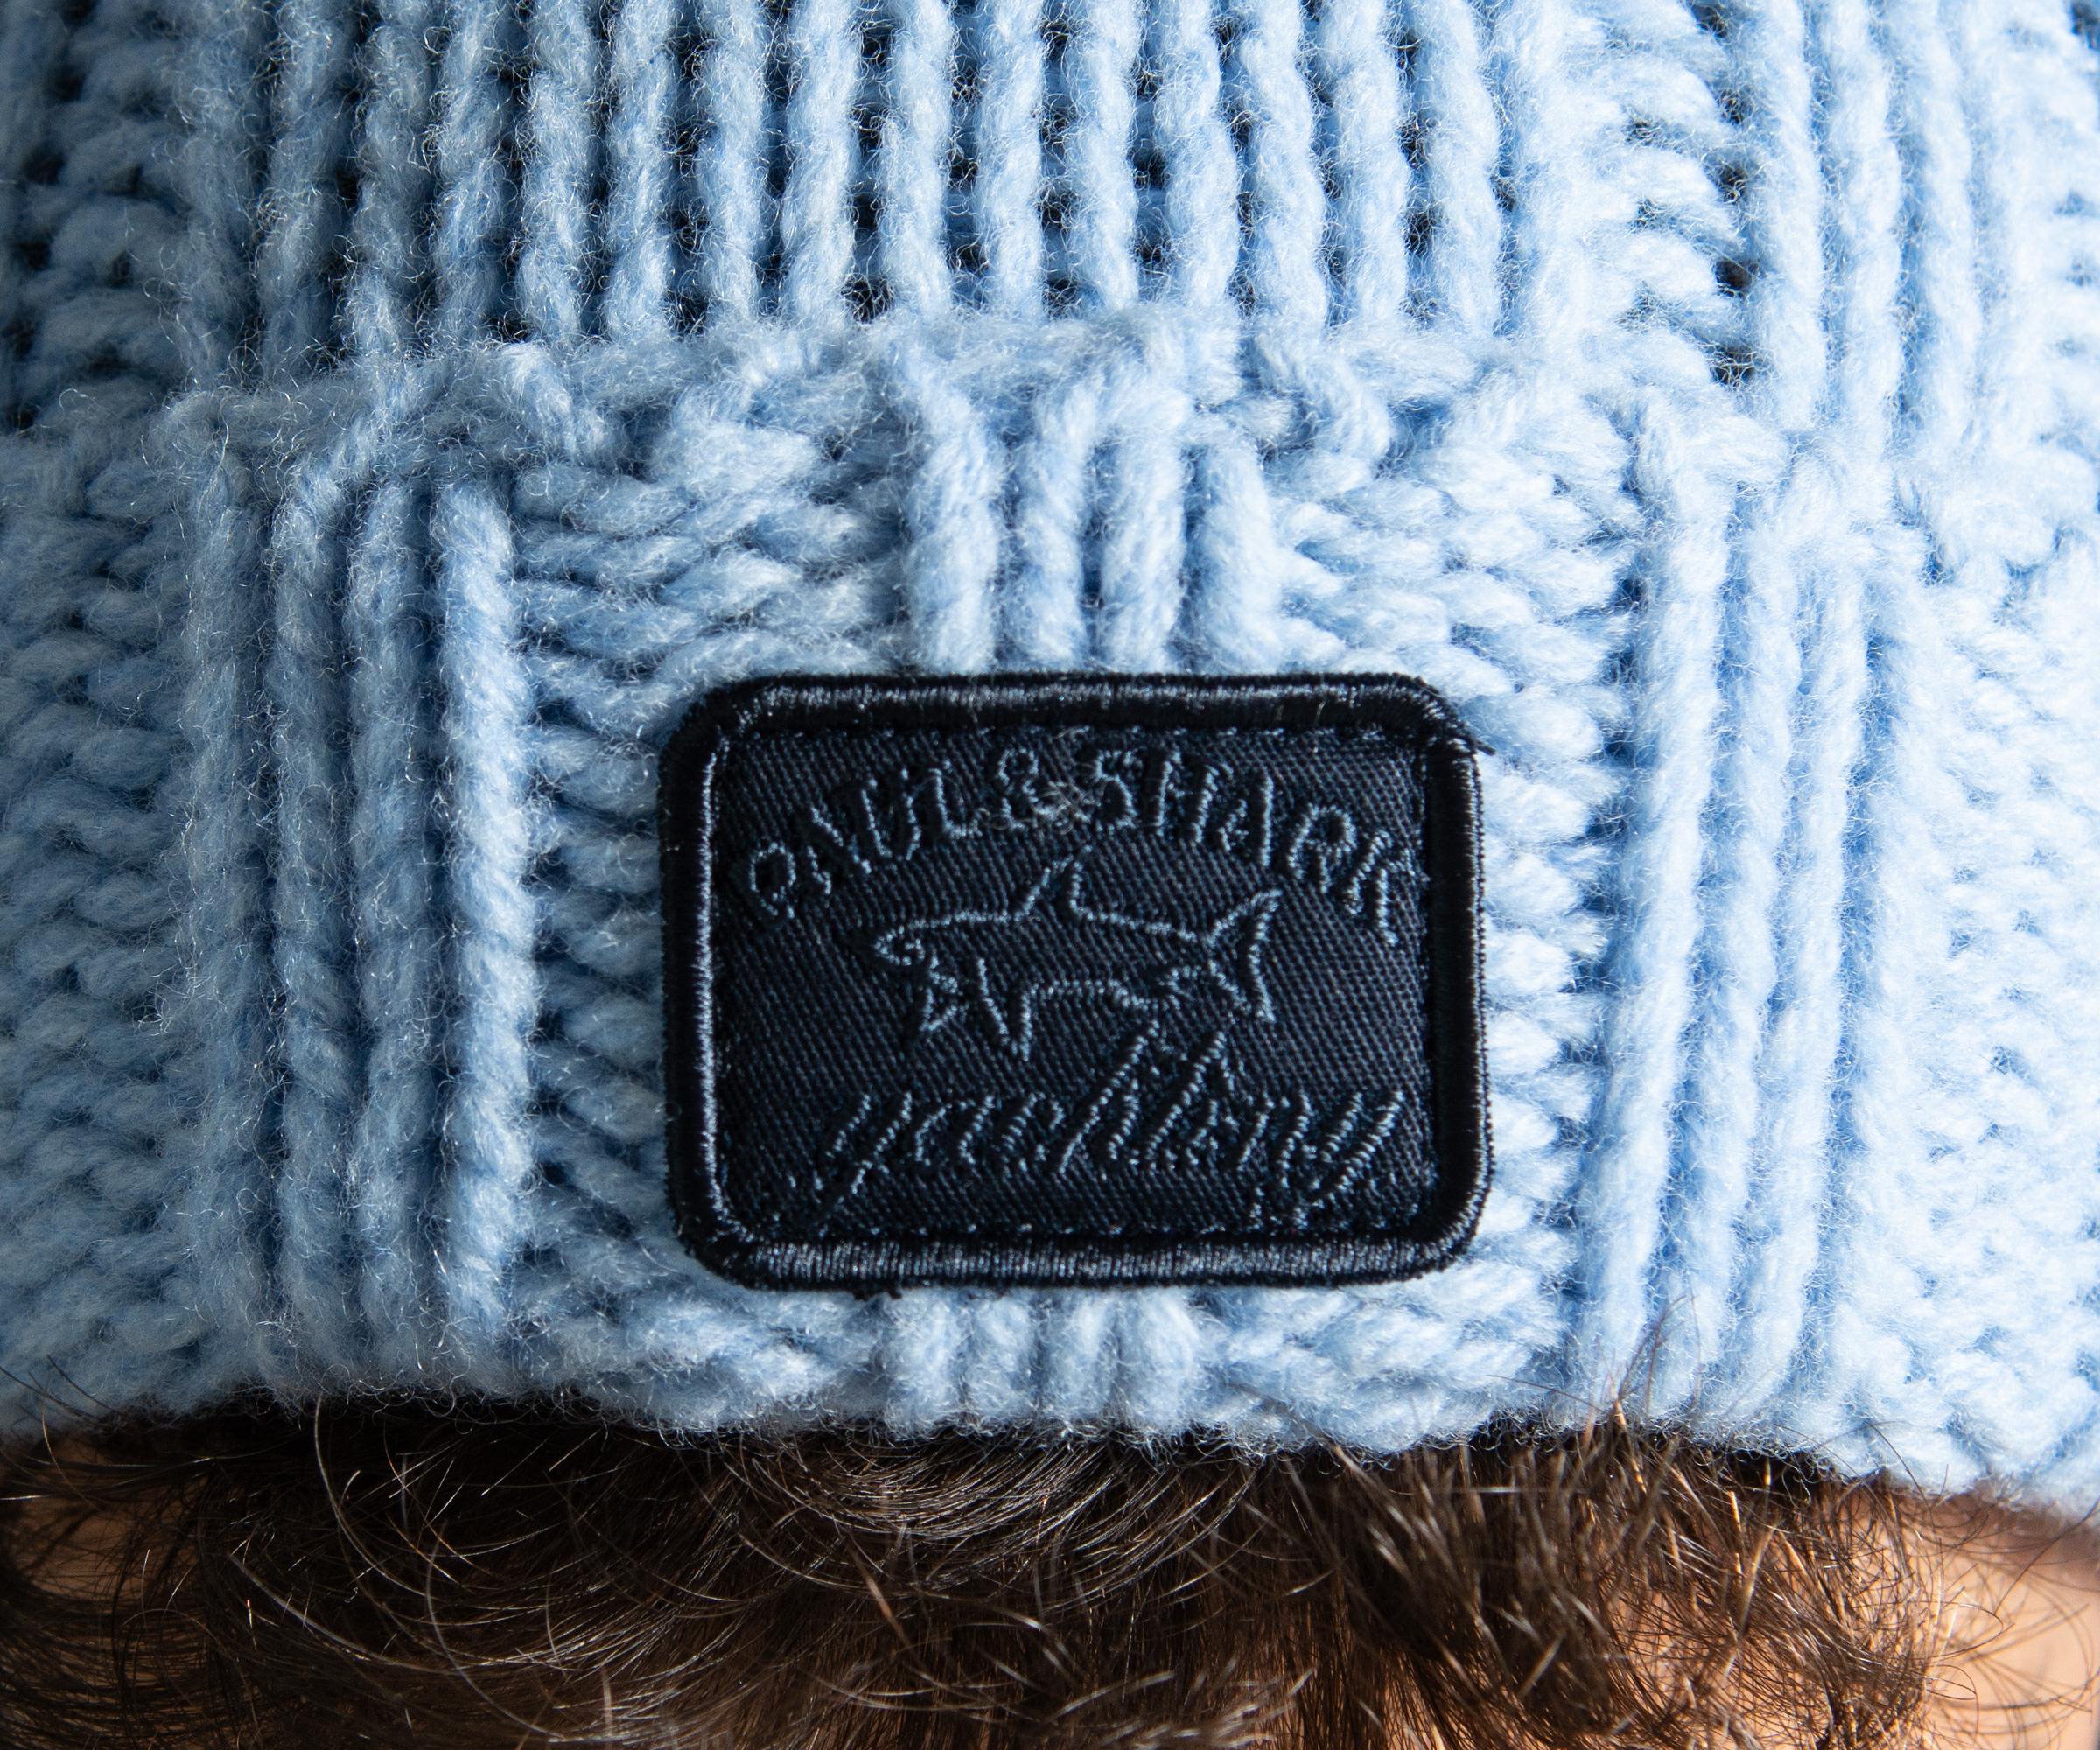 283807f58fd6b9 Paul & Shark Cable Knit Bobble Hat Light Blue in Blue for Men - Lyst